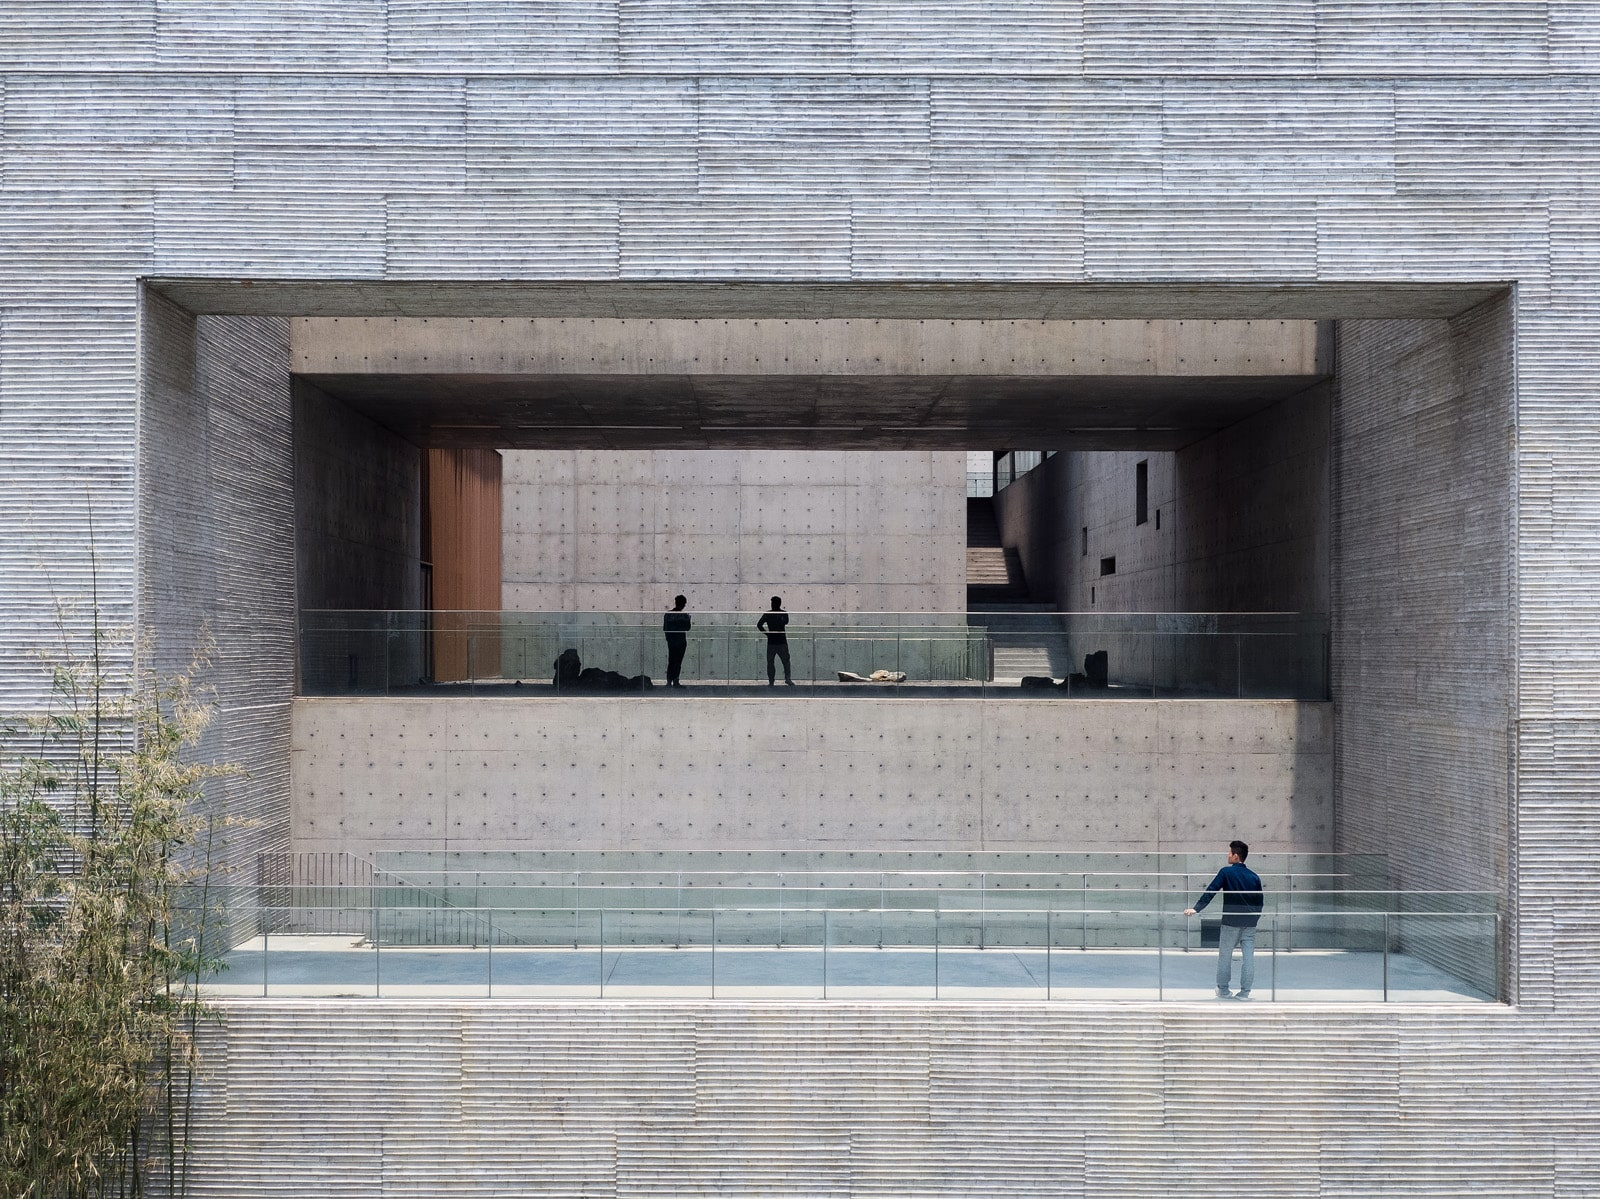 Shou County Culture and Art Center  - 20210702 Zhu Pei ShouCountyCultureArtCenter 06 41